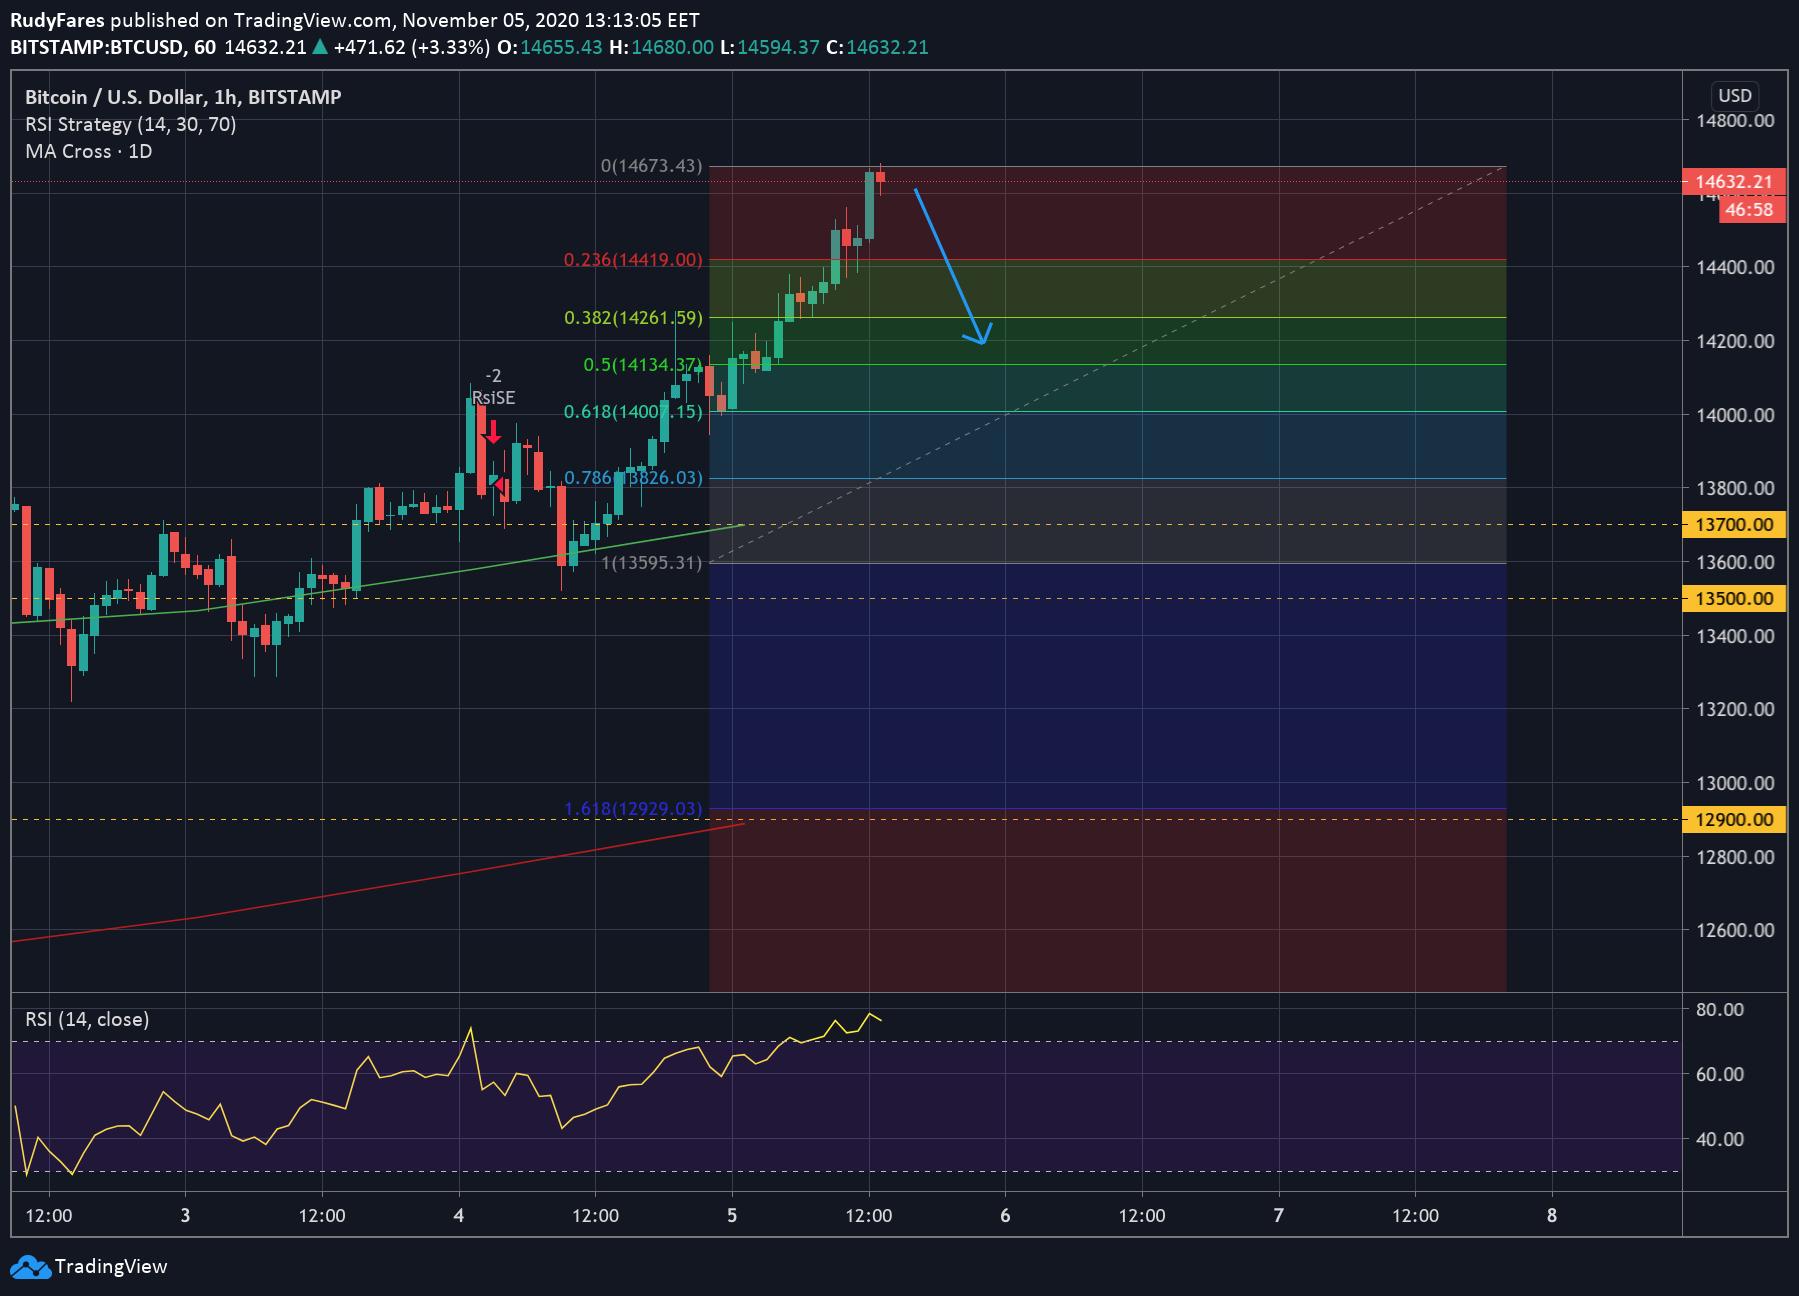 BTC/USD price 1H chart, Fibonacci Retracement